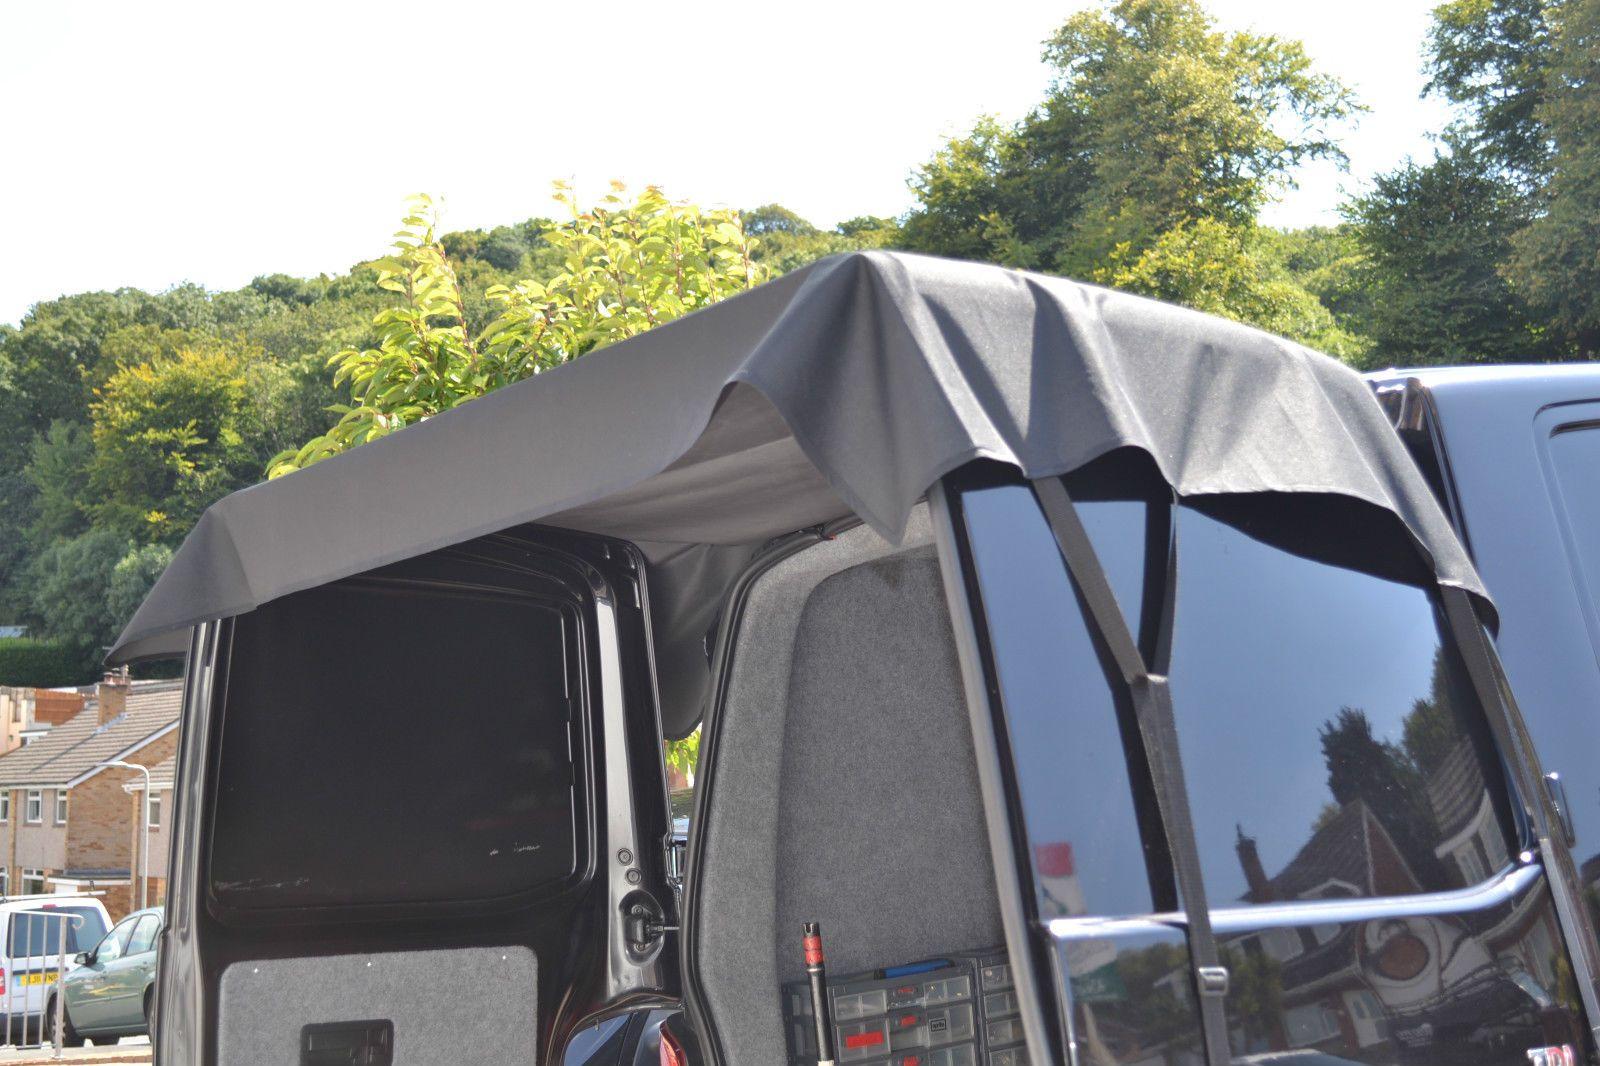 Details About Vw T4 Transporter Rear Barn Doors Awning Cover Transporter Kombis Camper